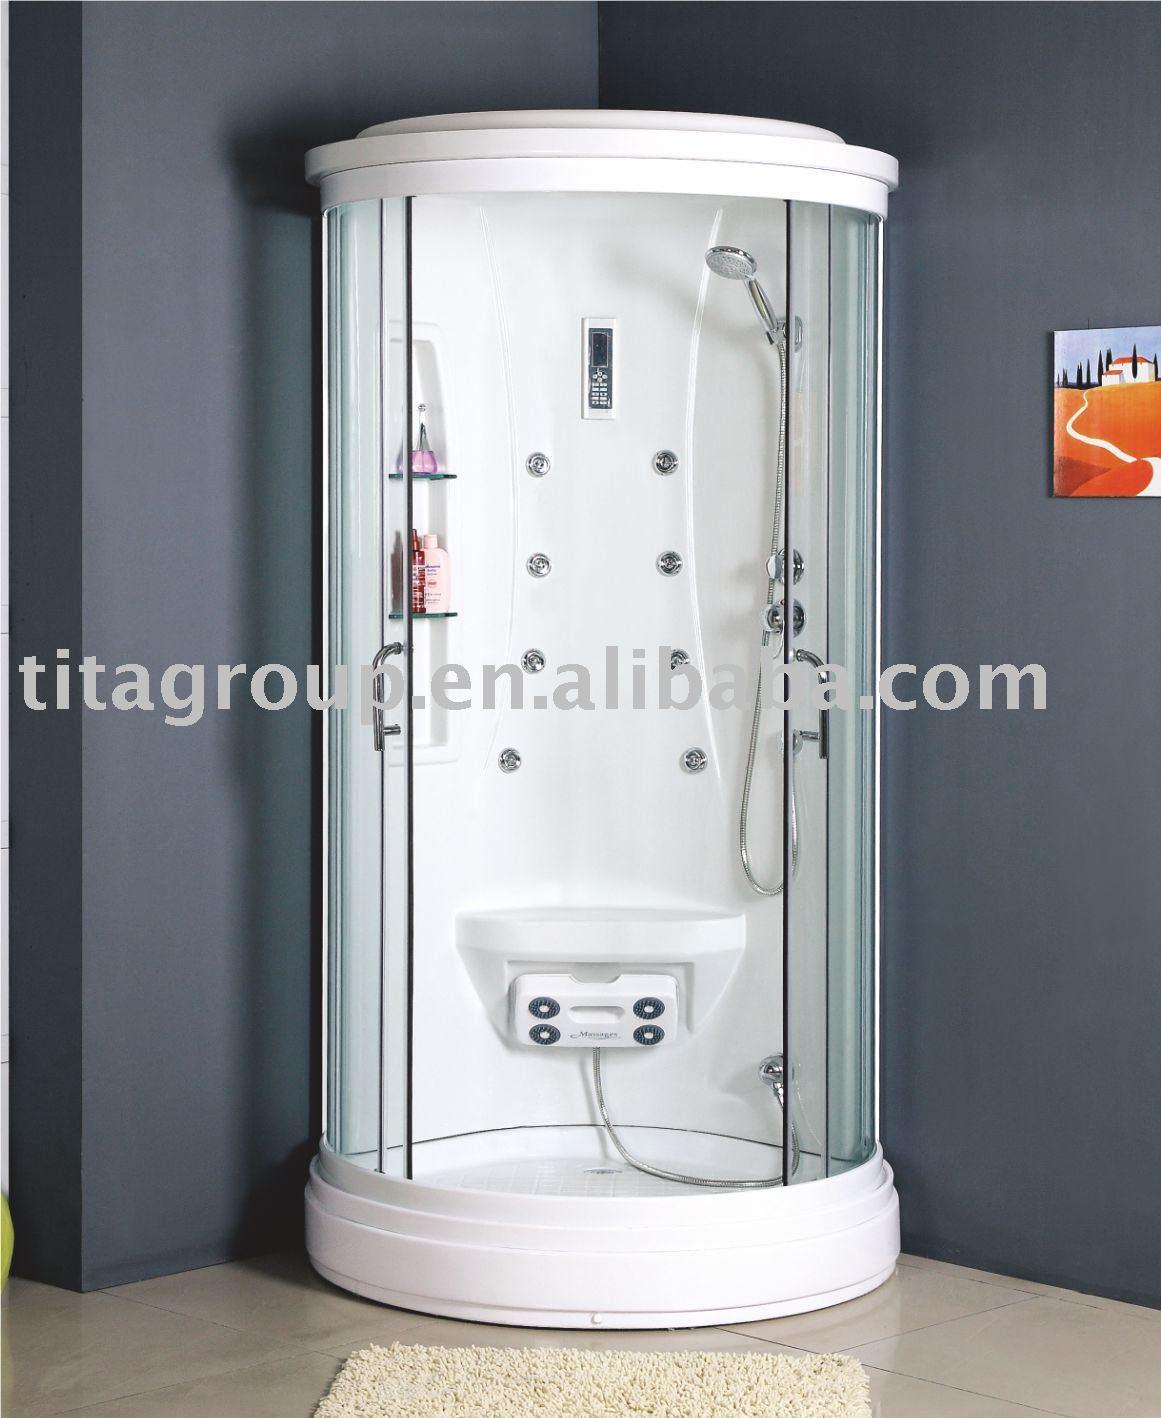 Salas De Baño Con Ducha:Bathroom Tubs and Showers Manufacturers